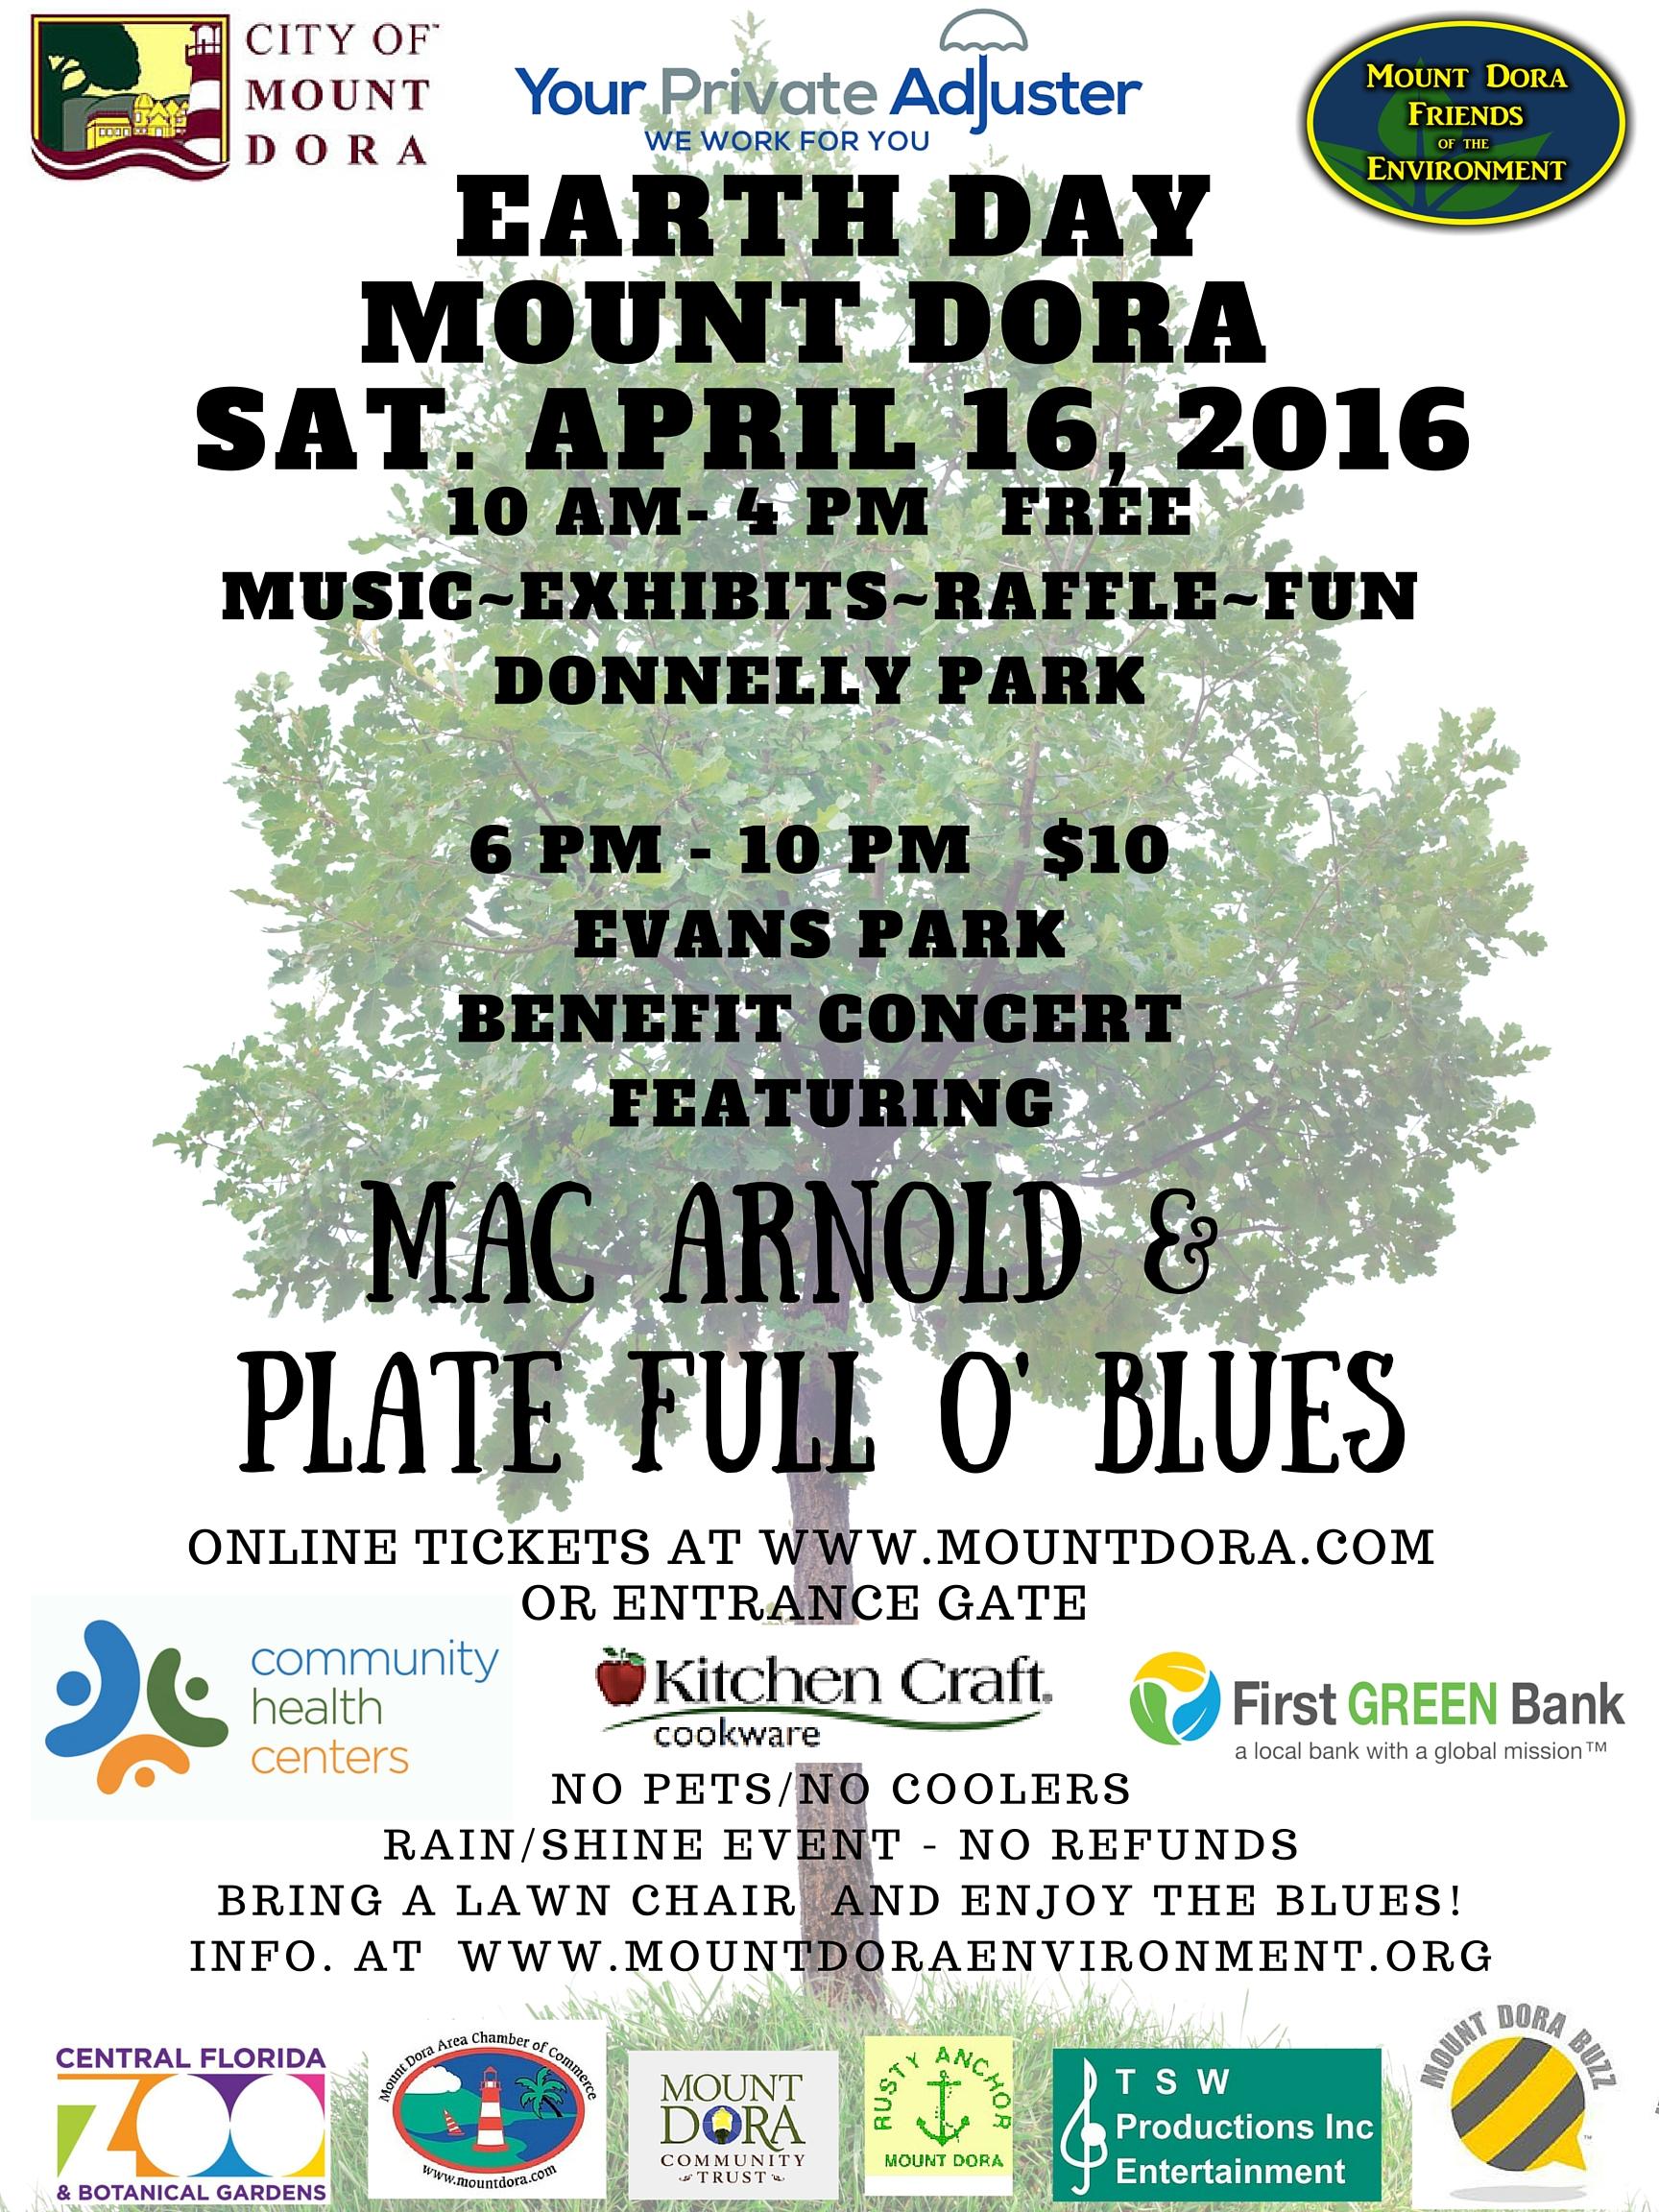 2016 - Mount Dora